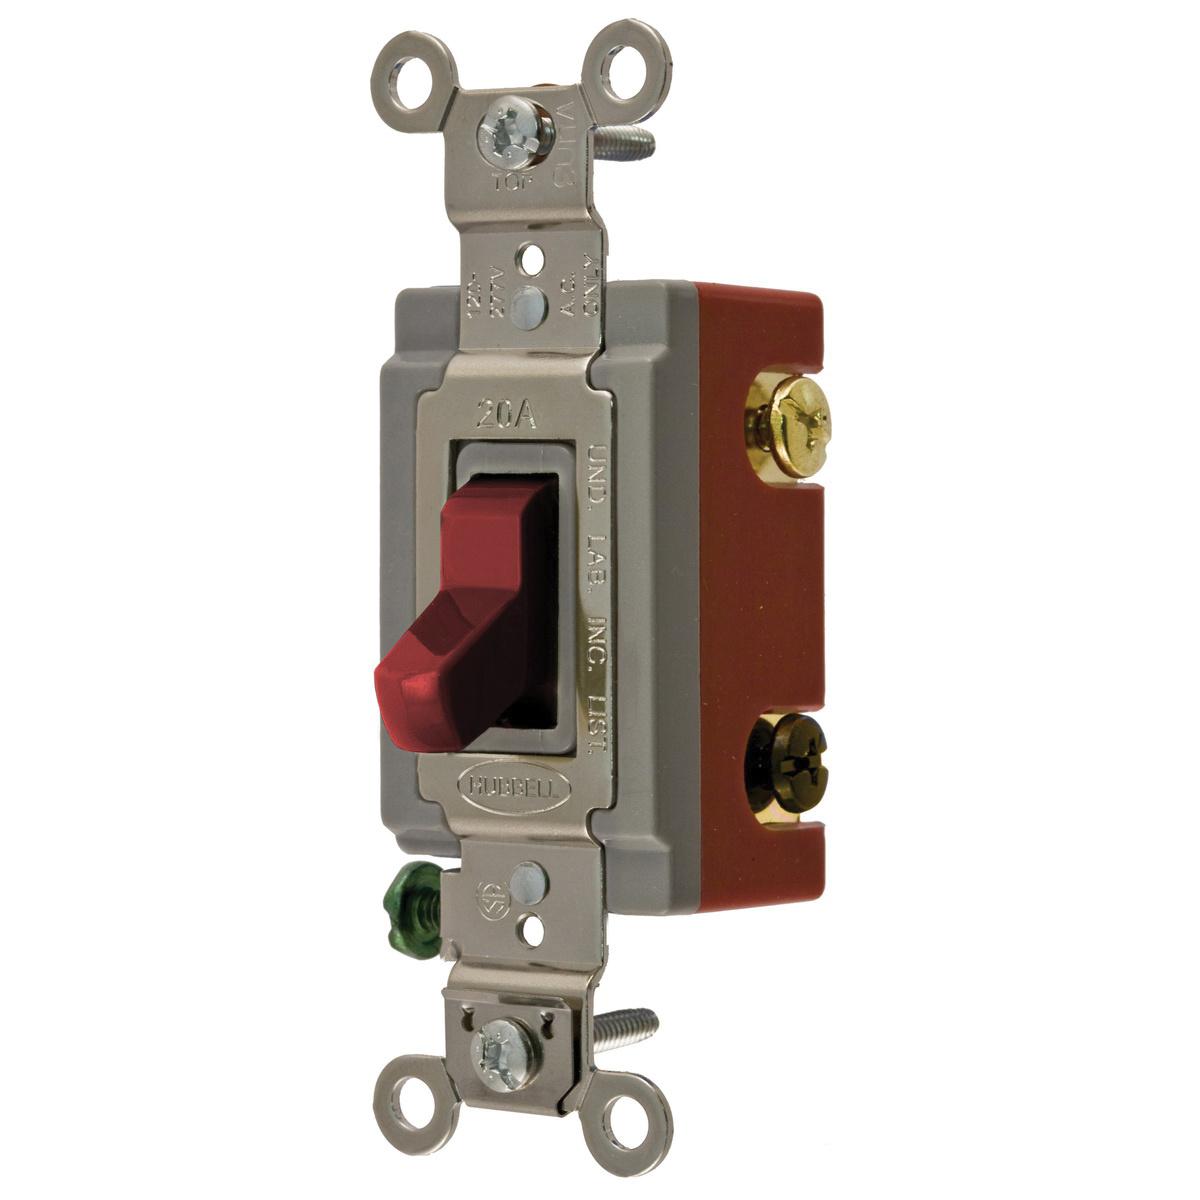 hubbell-wiring hbl1223r 120/277-volt ac 20-amp 3-way